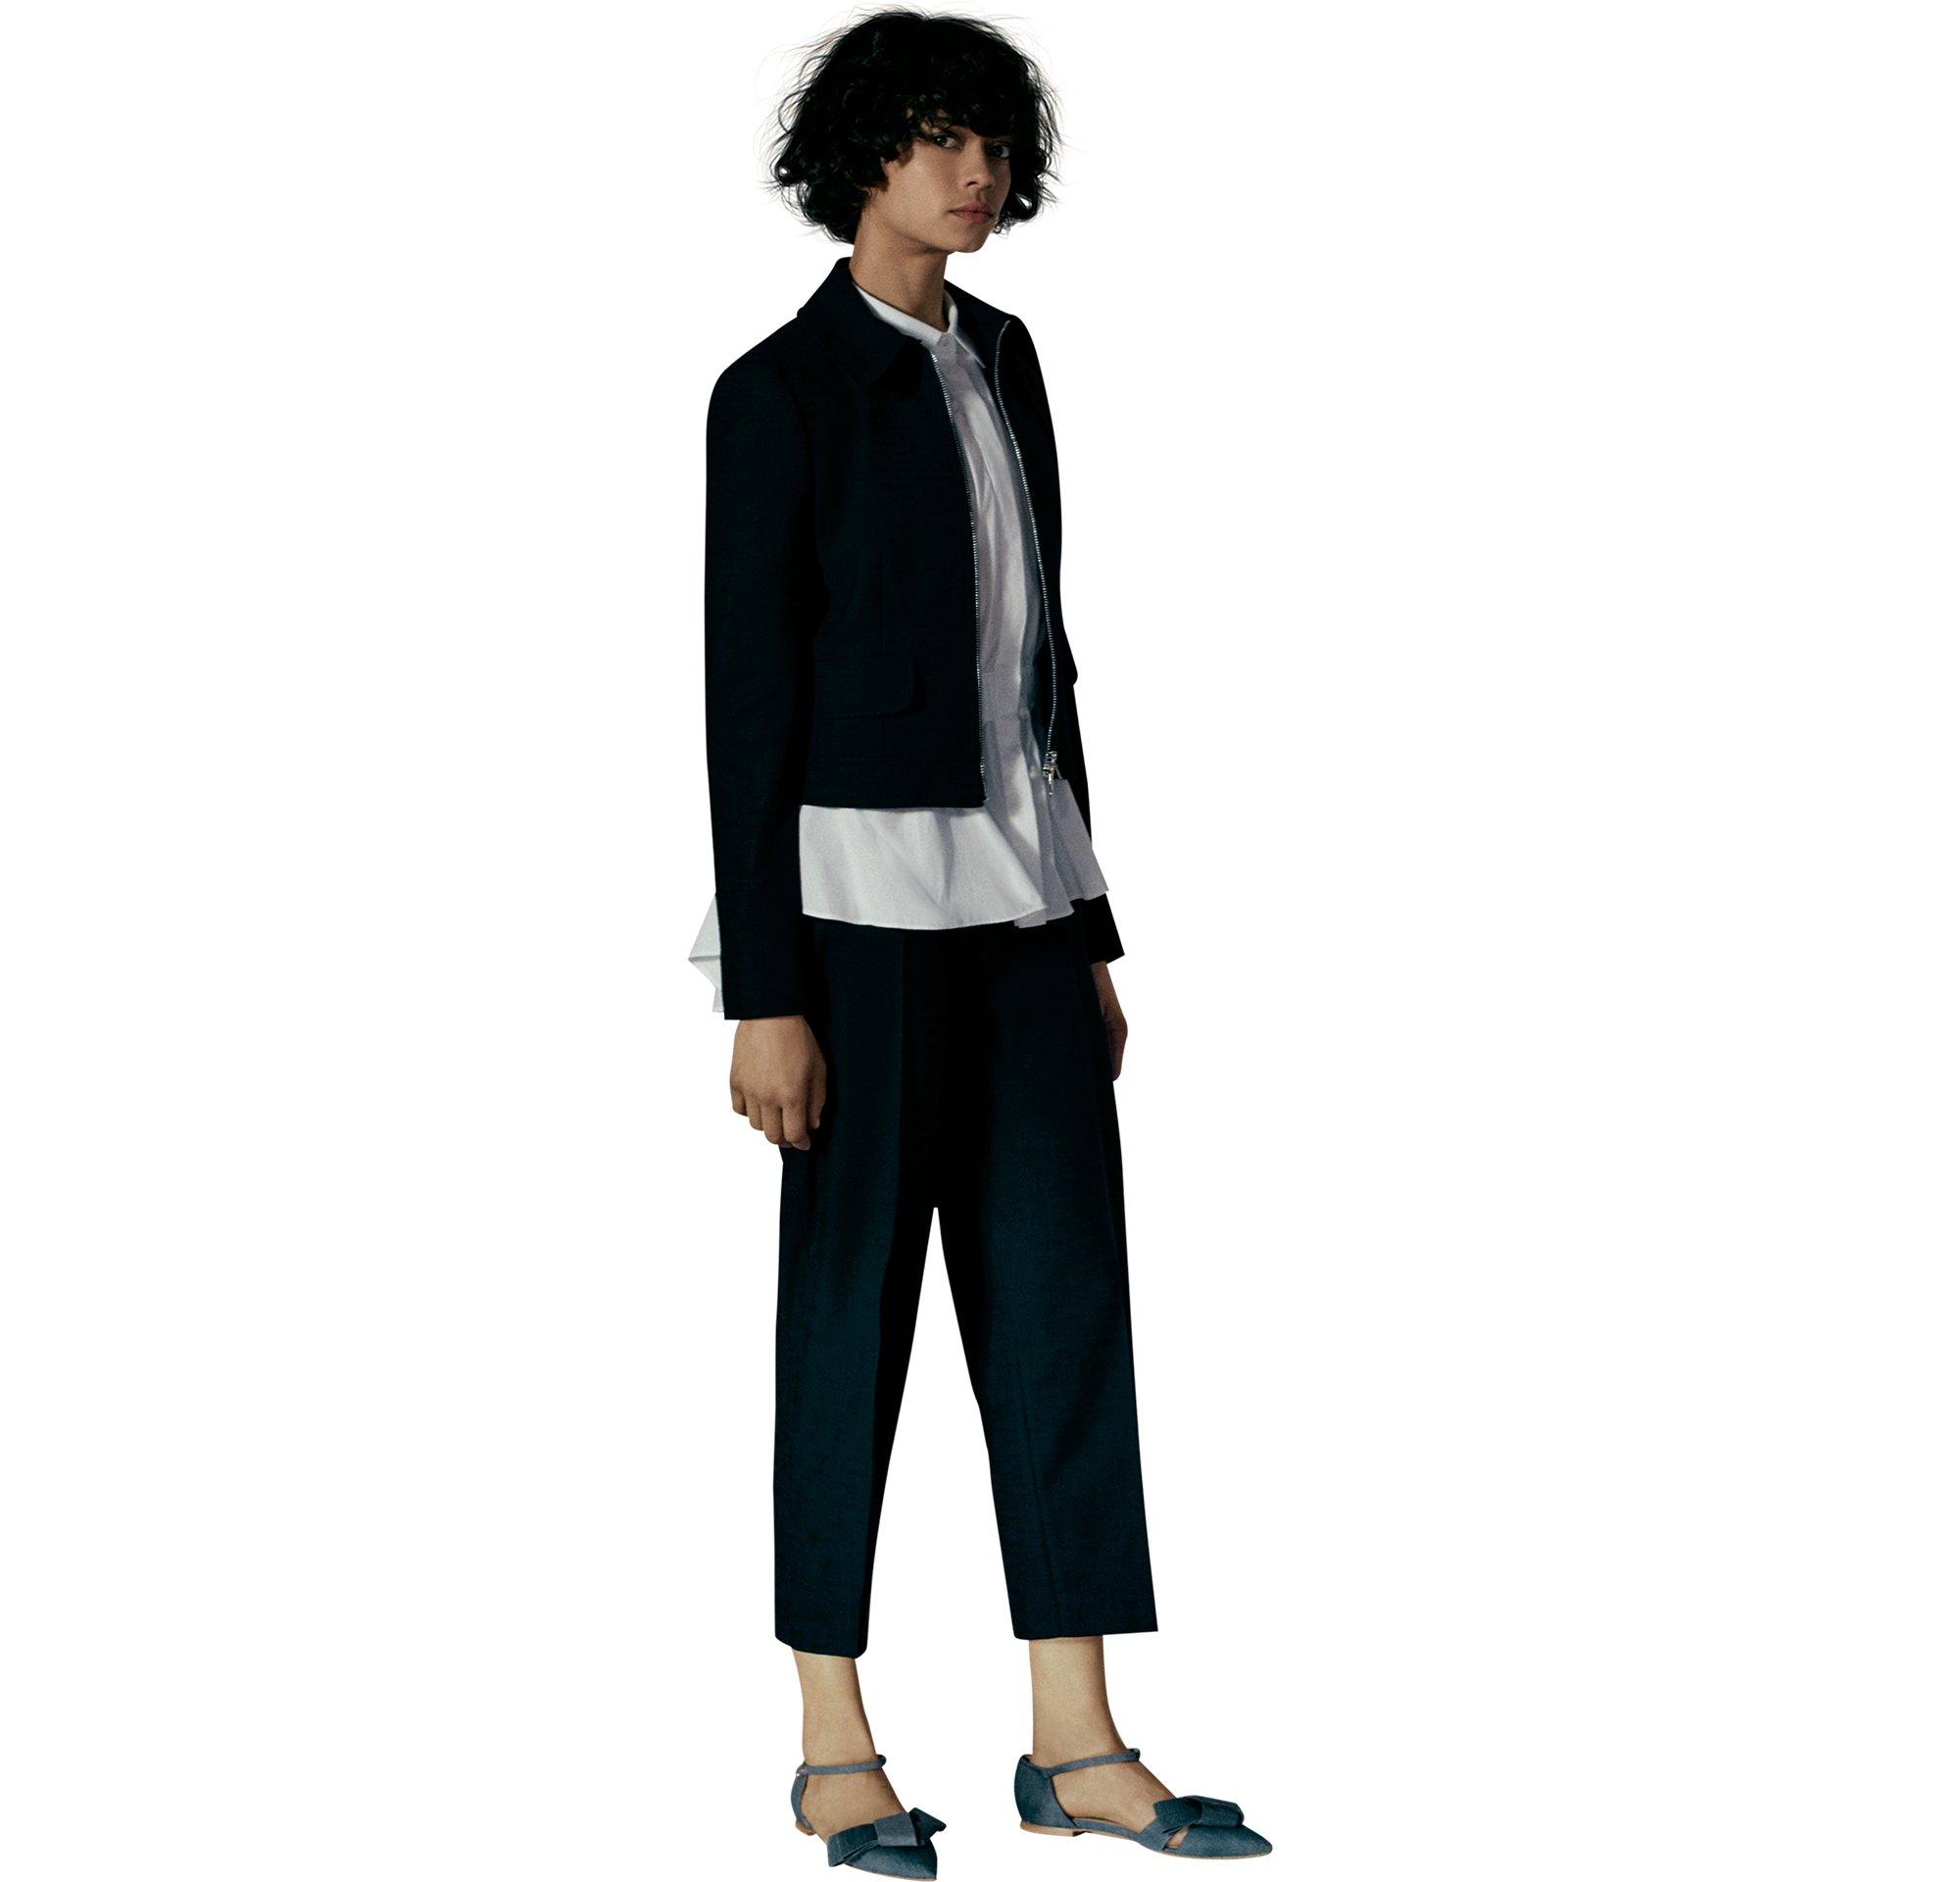 Blazer, shirt, trousers by HUGO